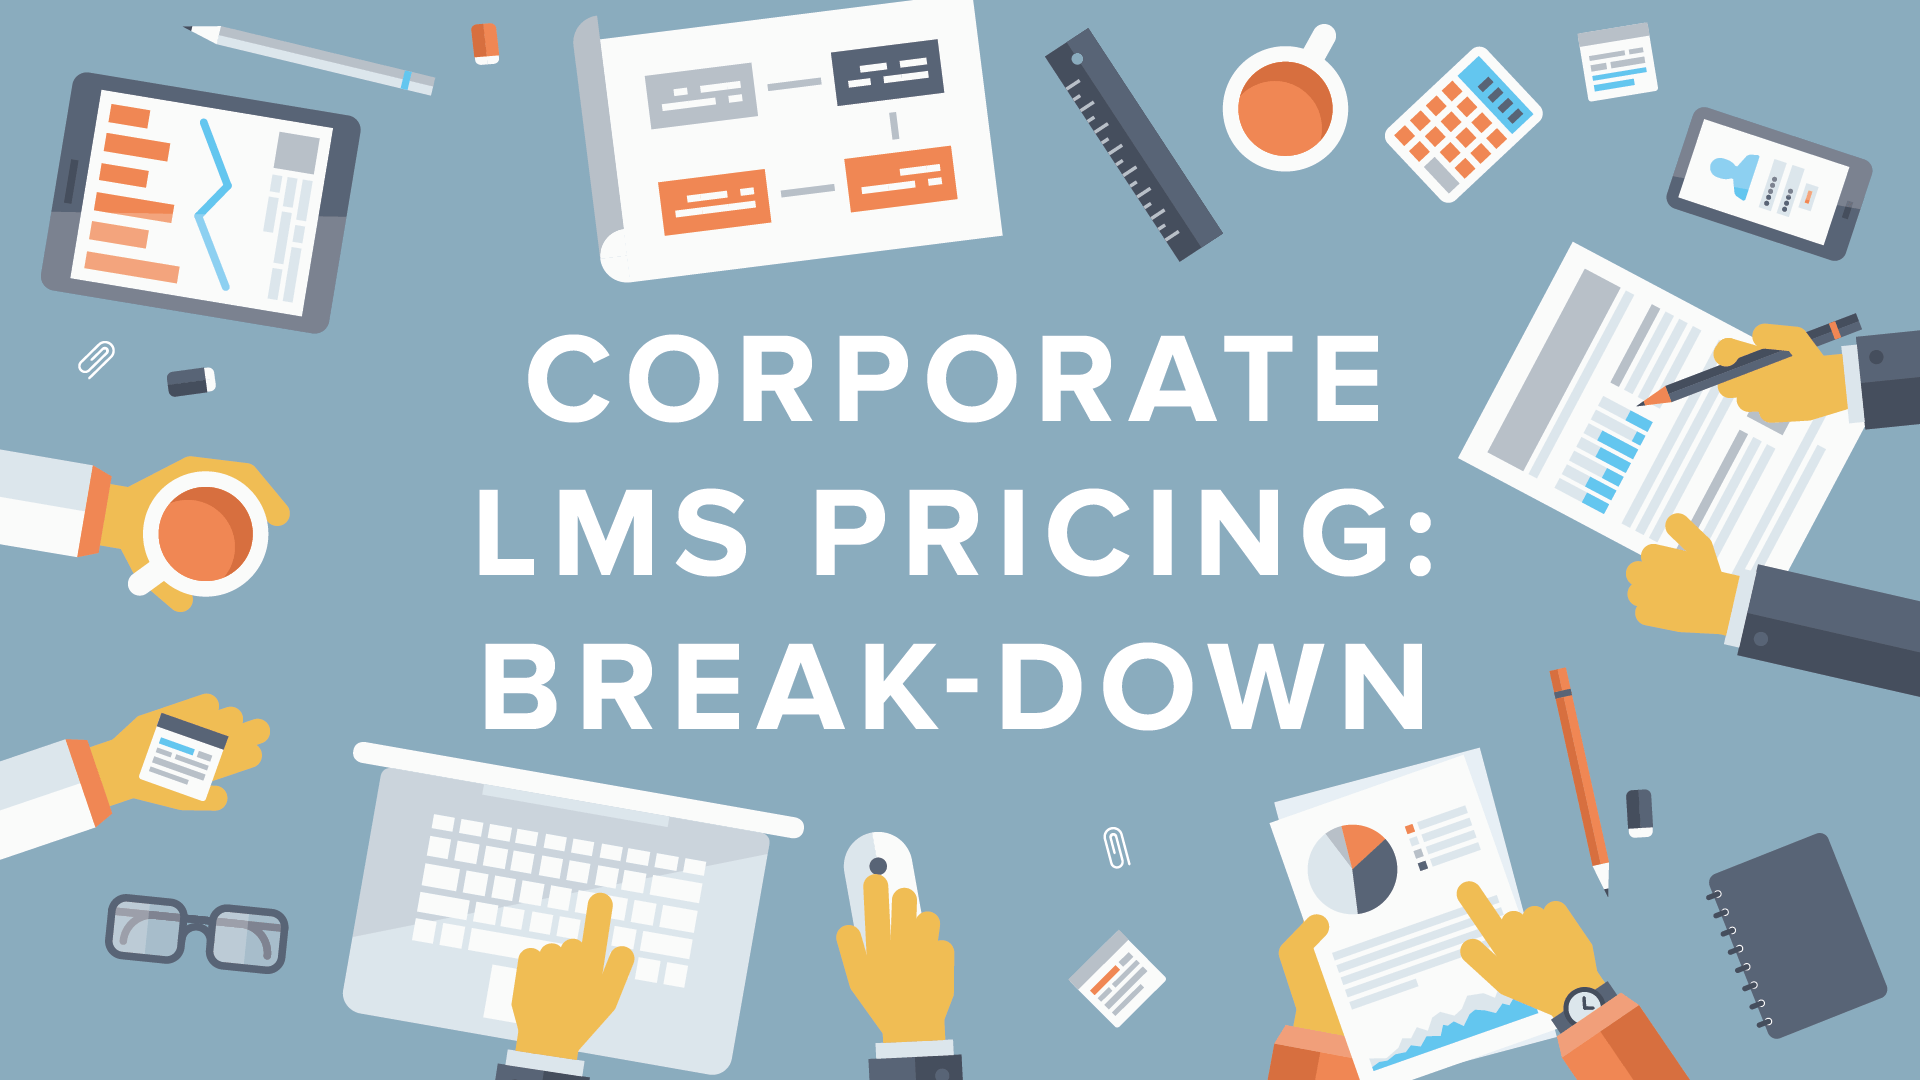 Corporate LMS Accounts & Pricing: A Break-Down - DigitalChalk Blog thumbnail